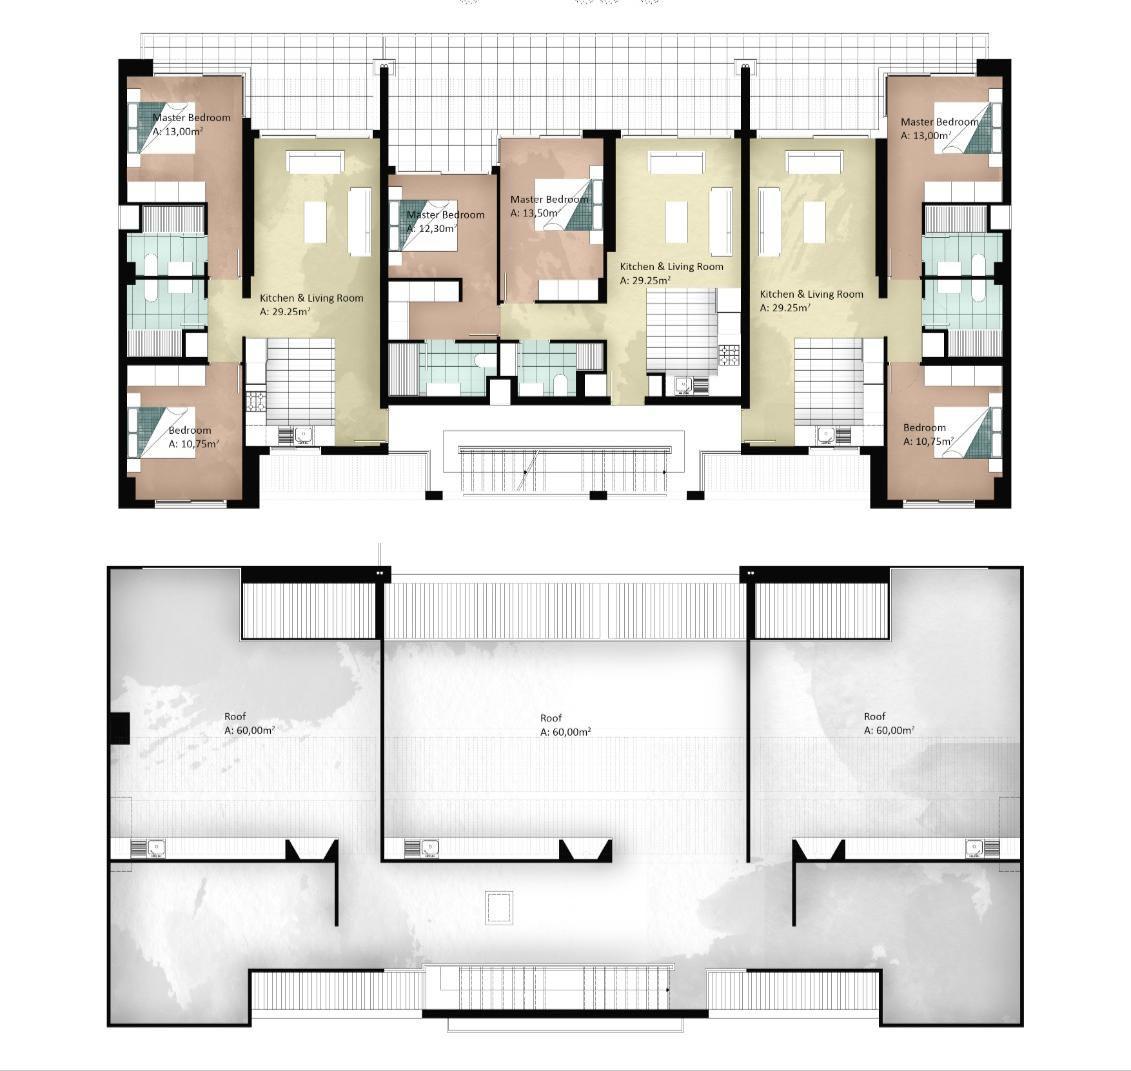 Block 8 & 9 - takvåning med 2 sovrum